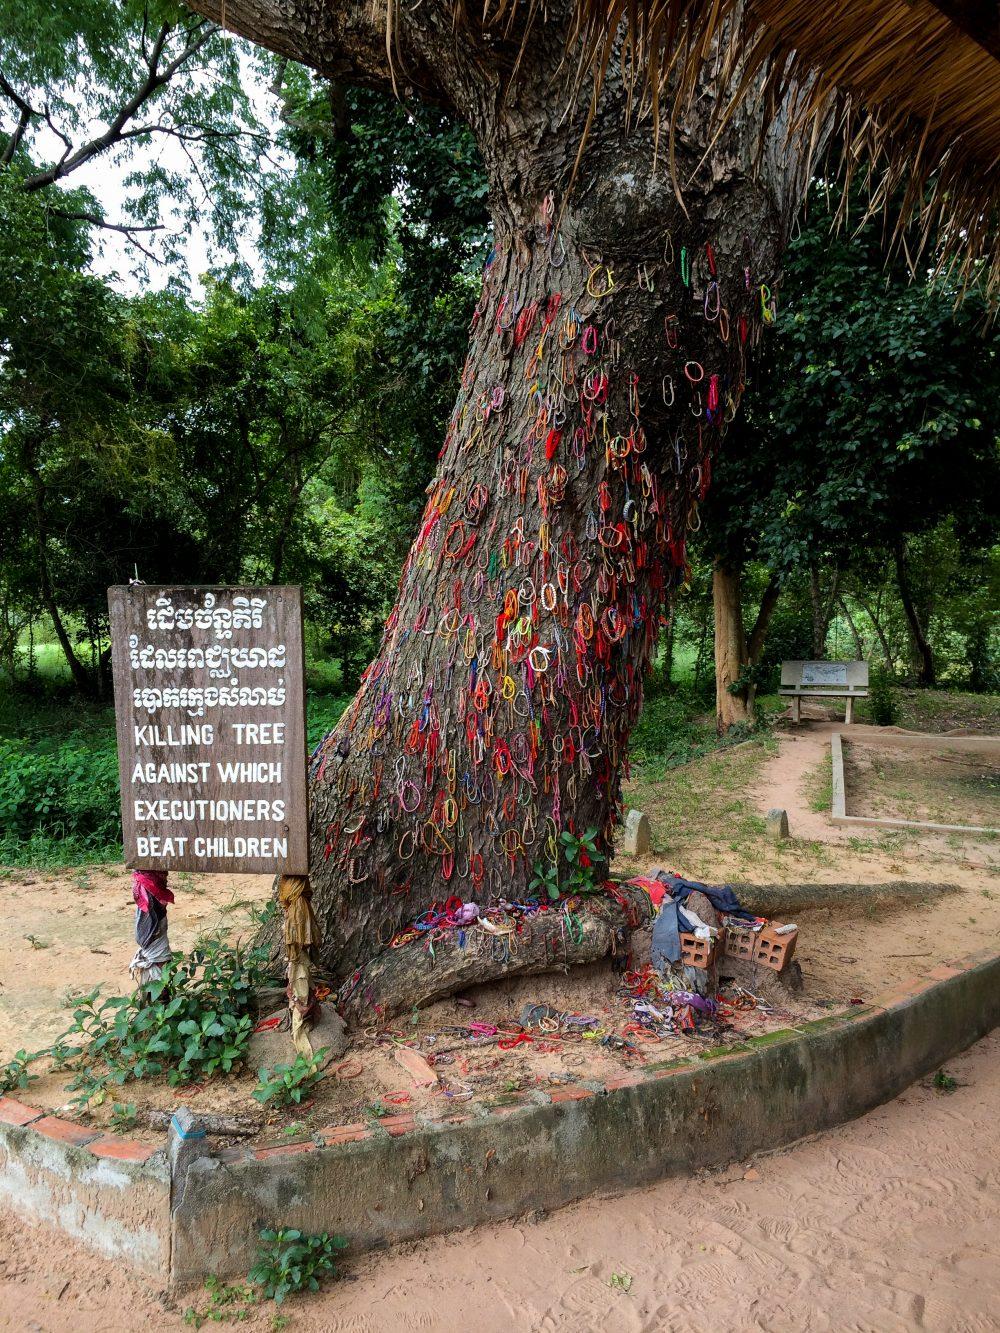 The Killing Tree at Choeung Ek Killing Fields